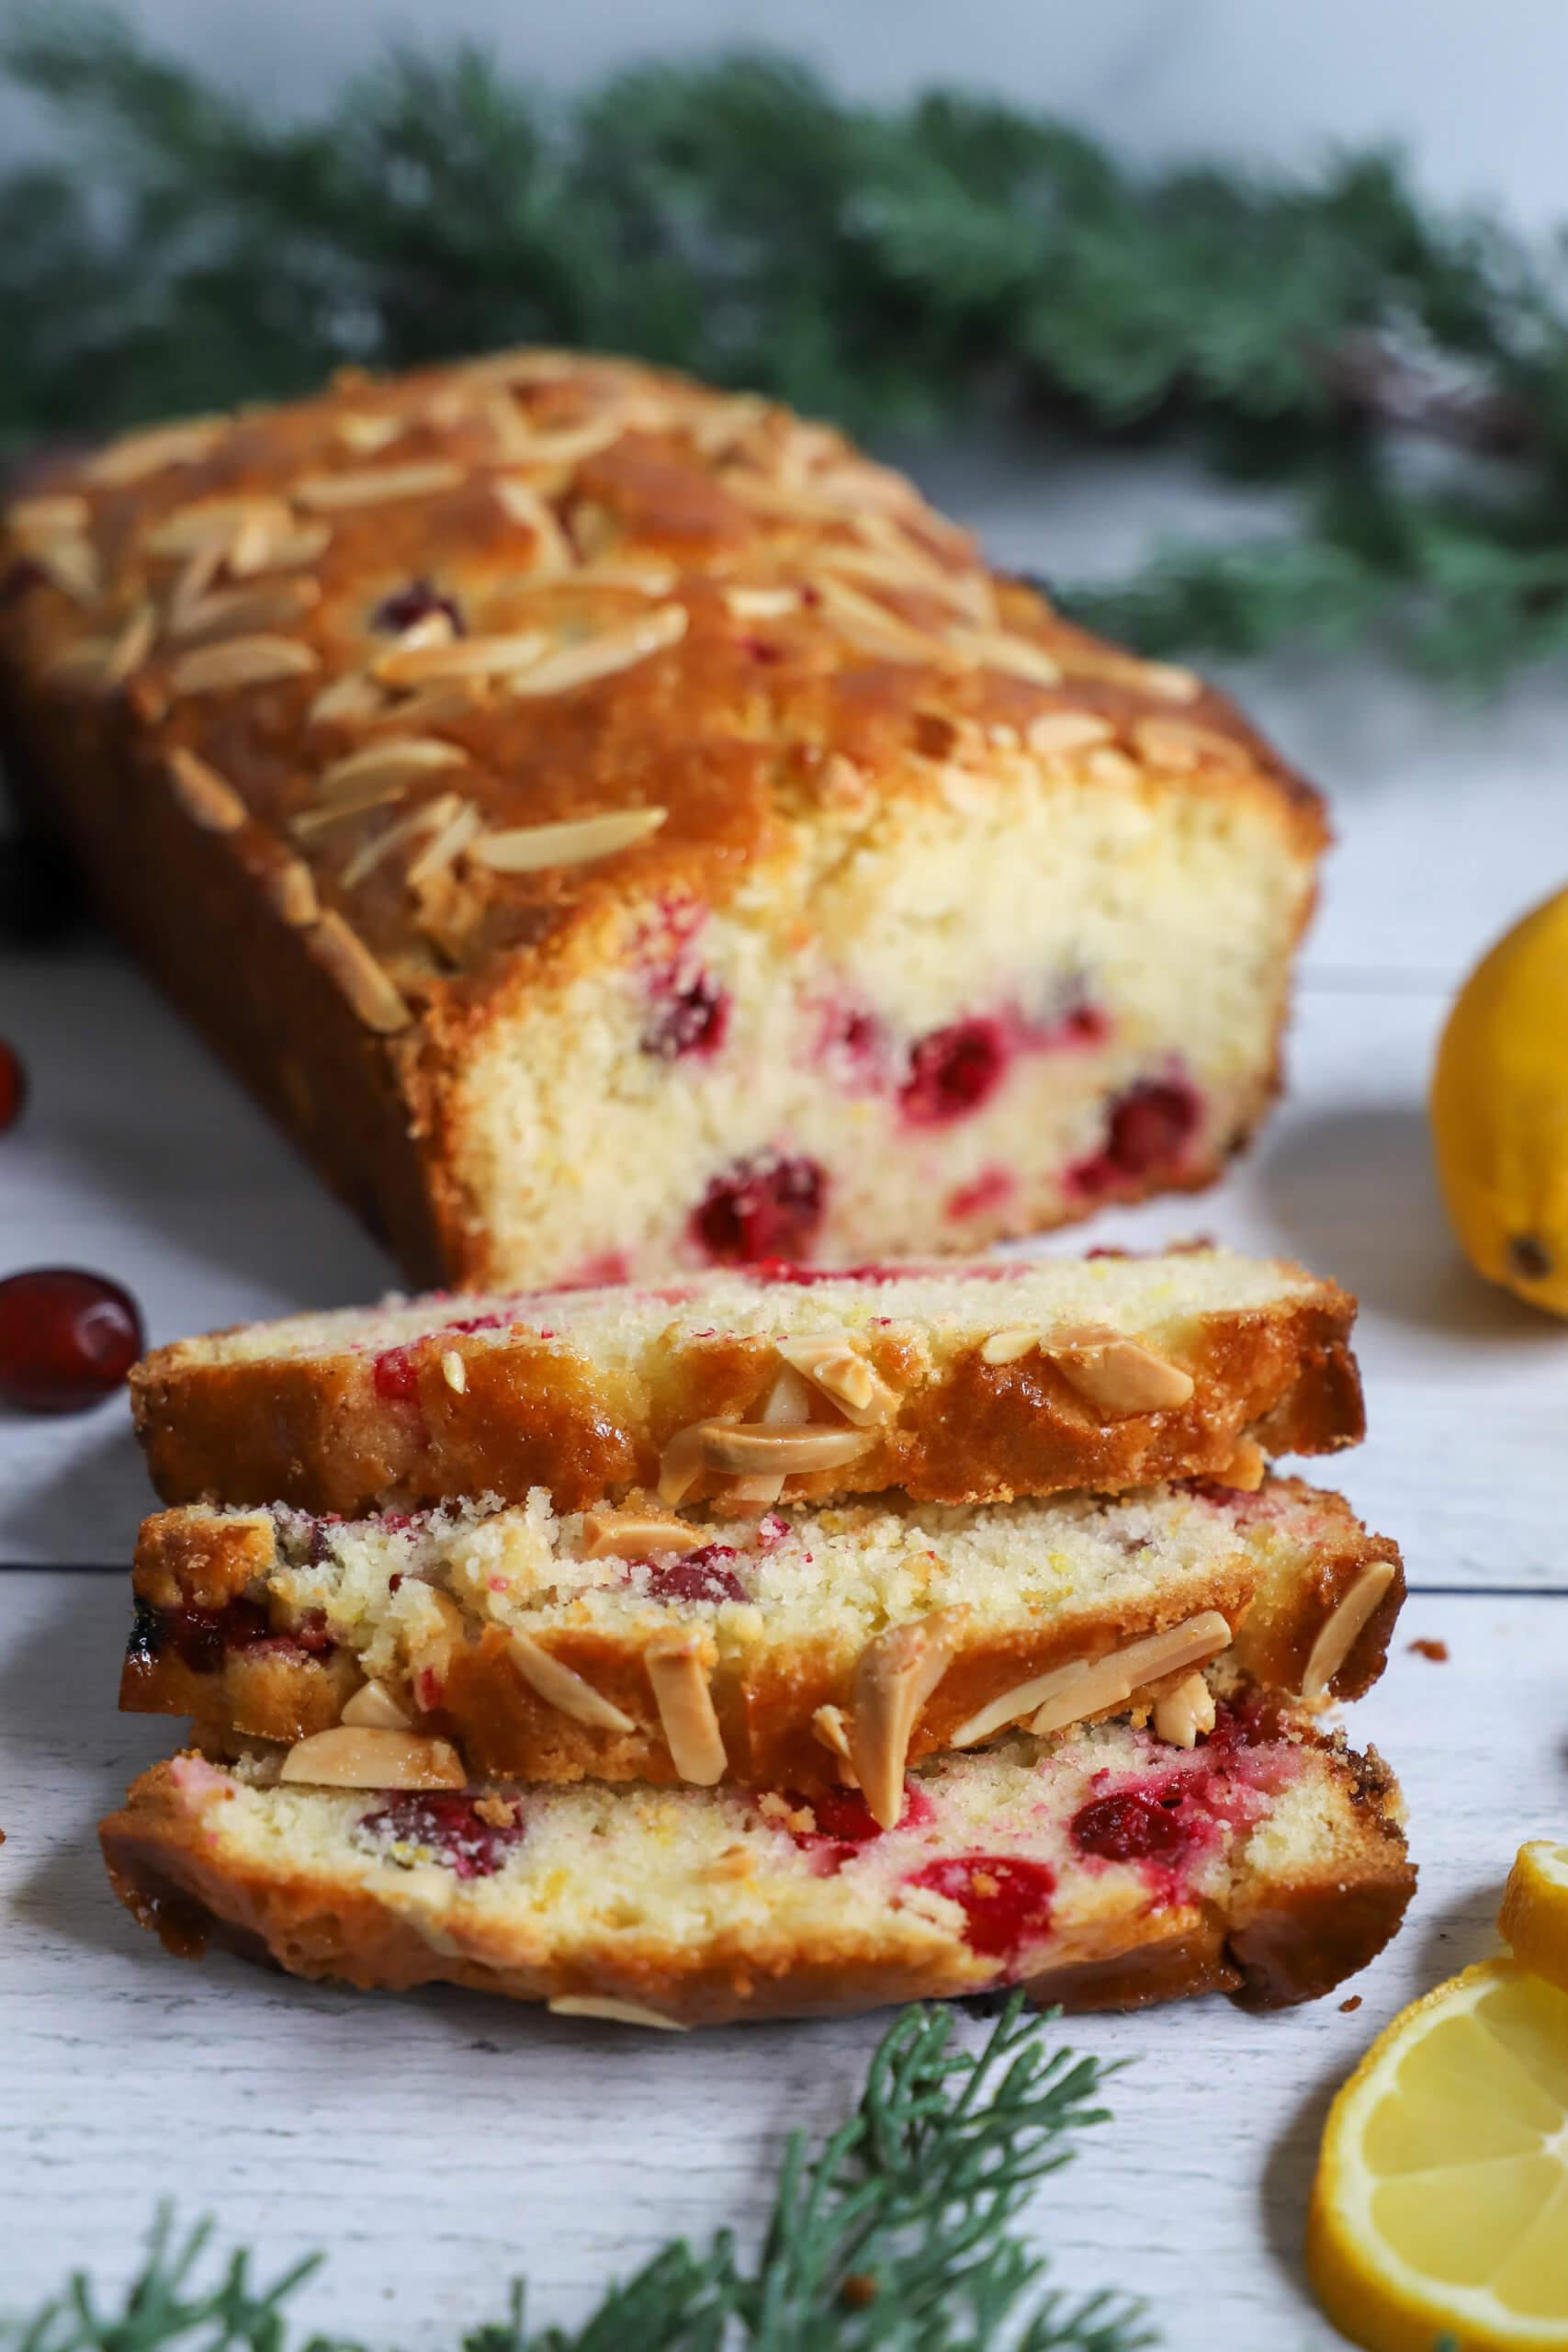 Lemon Cranberry Bread with Almonds